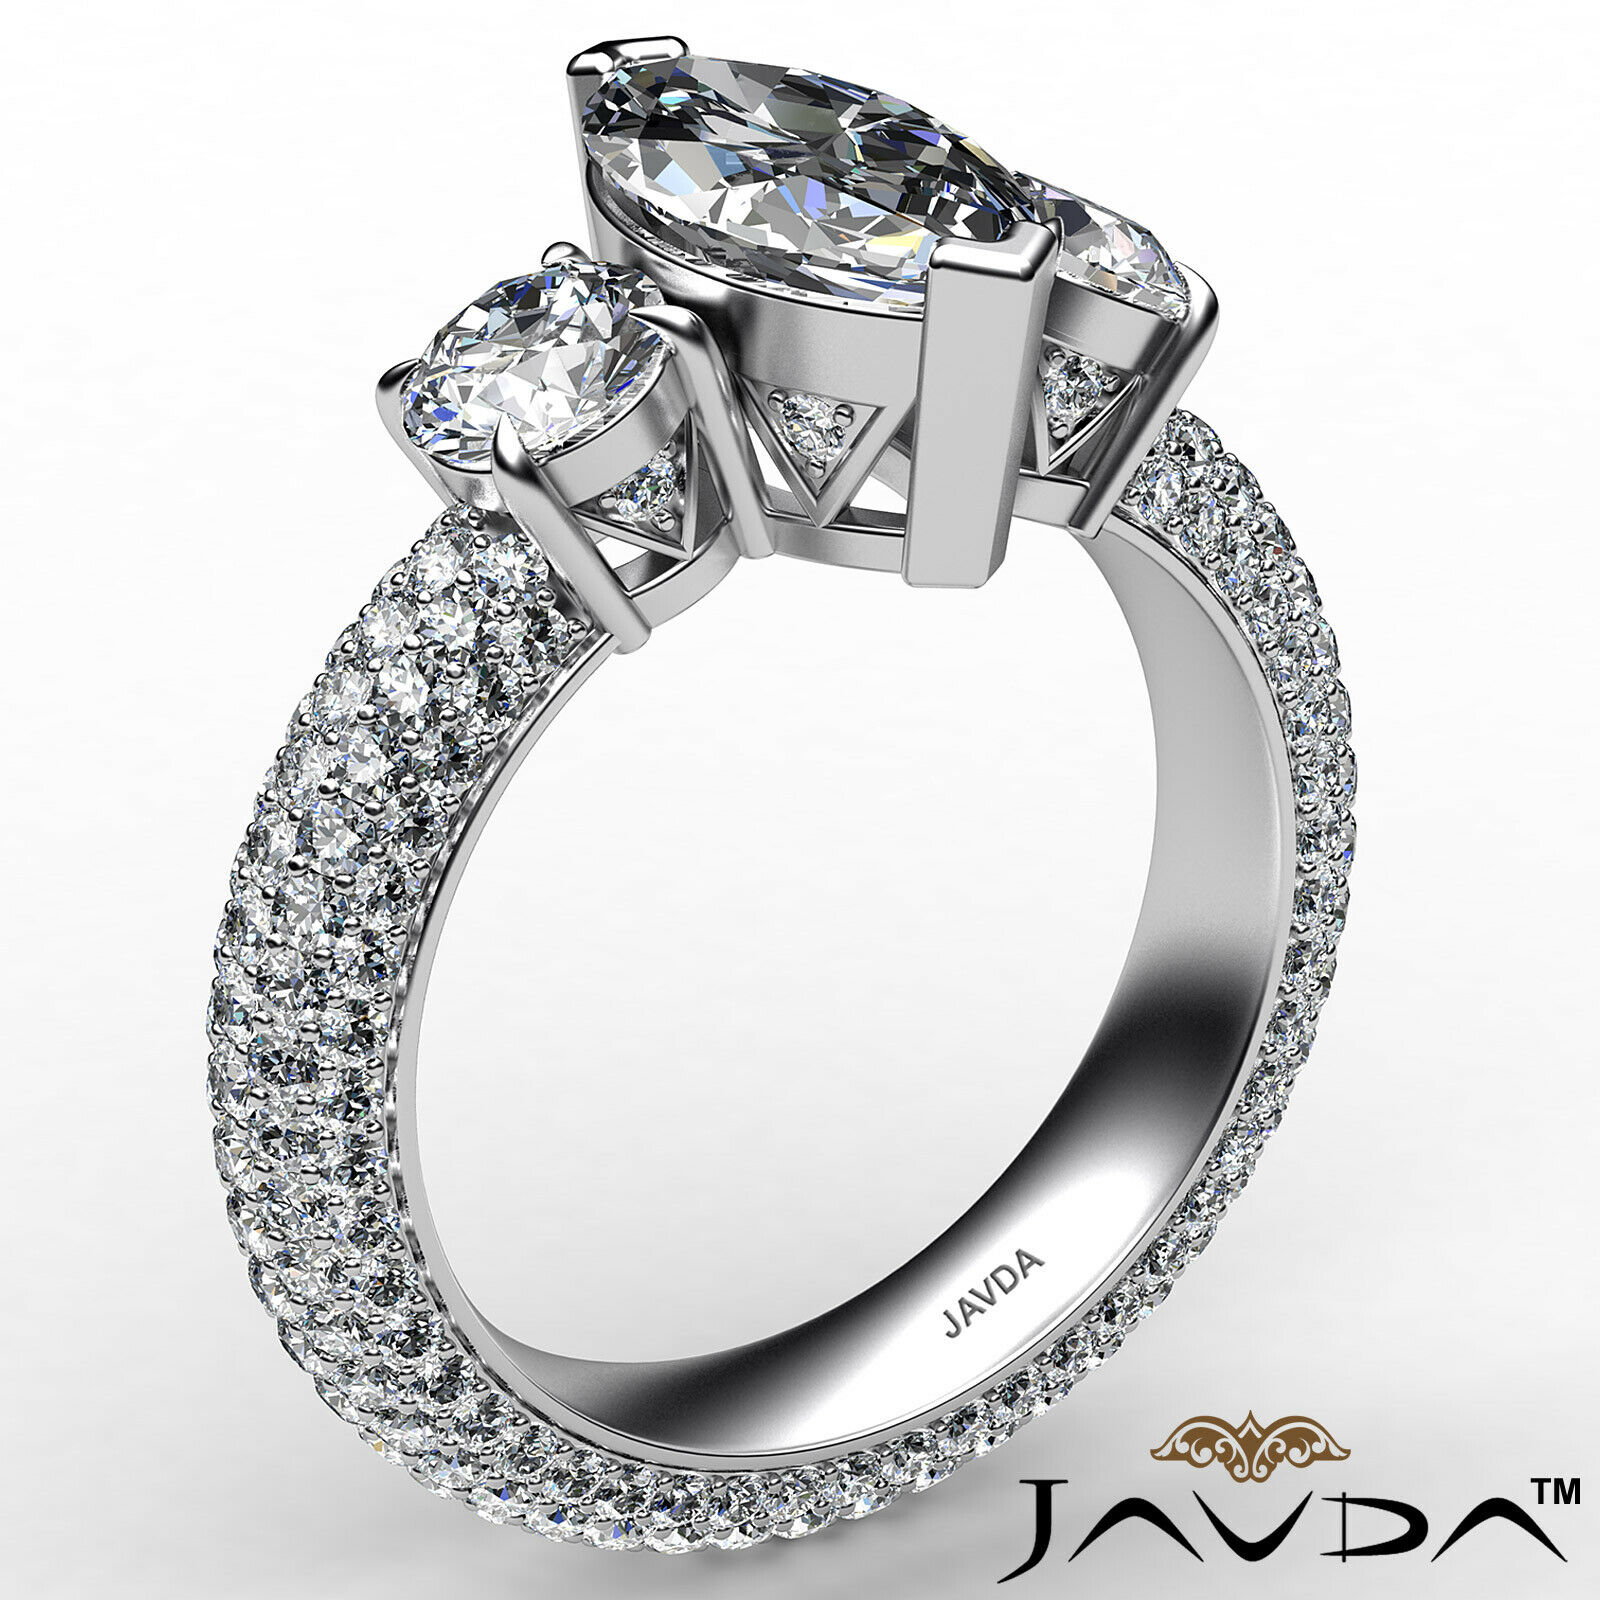 Marquise Diamond Engagement Pave Set Ring GIA K Color & VVS2 clarity 3.05 ctw 3